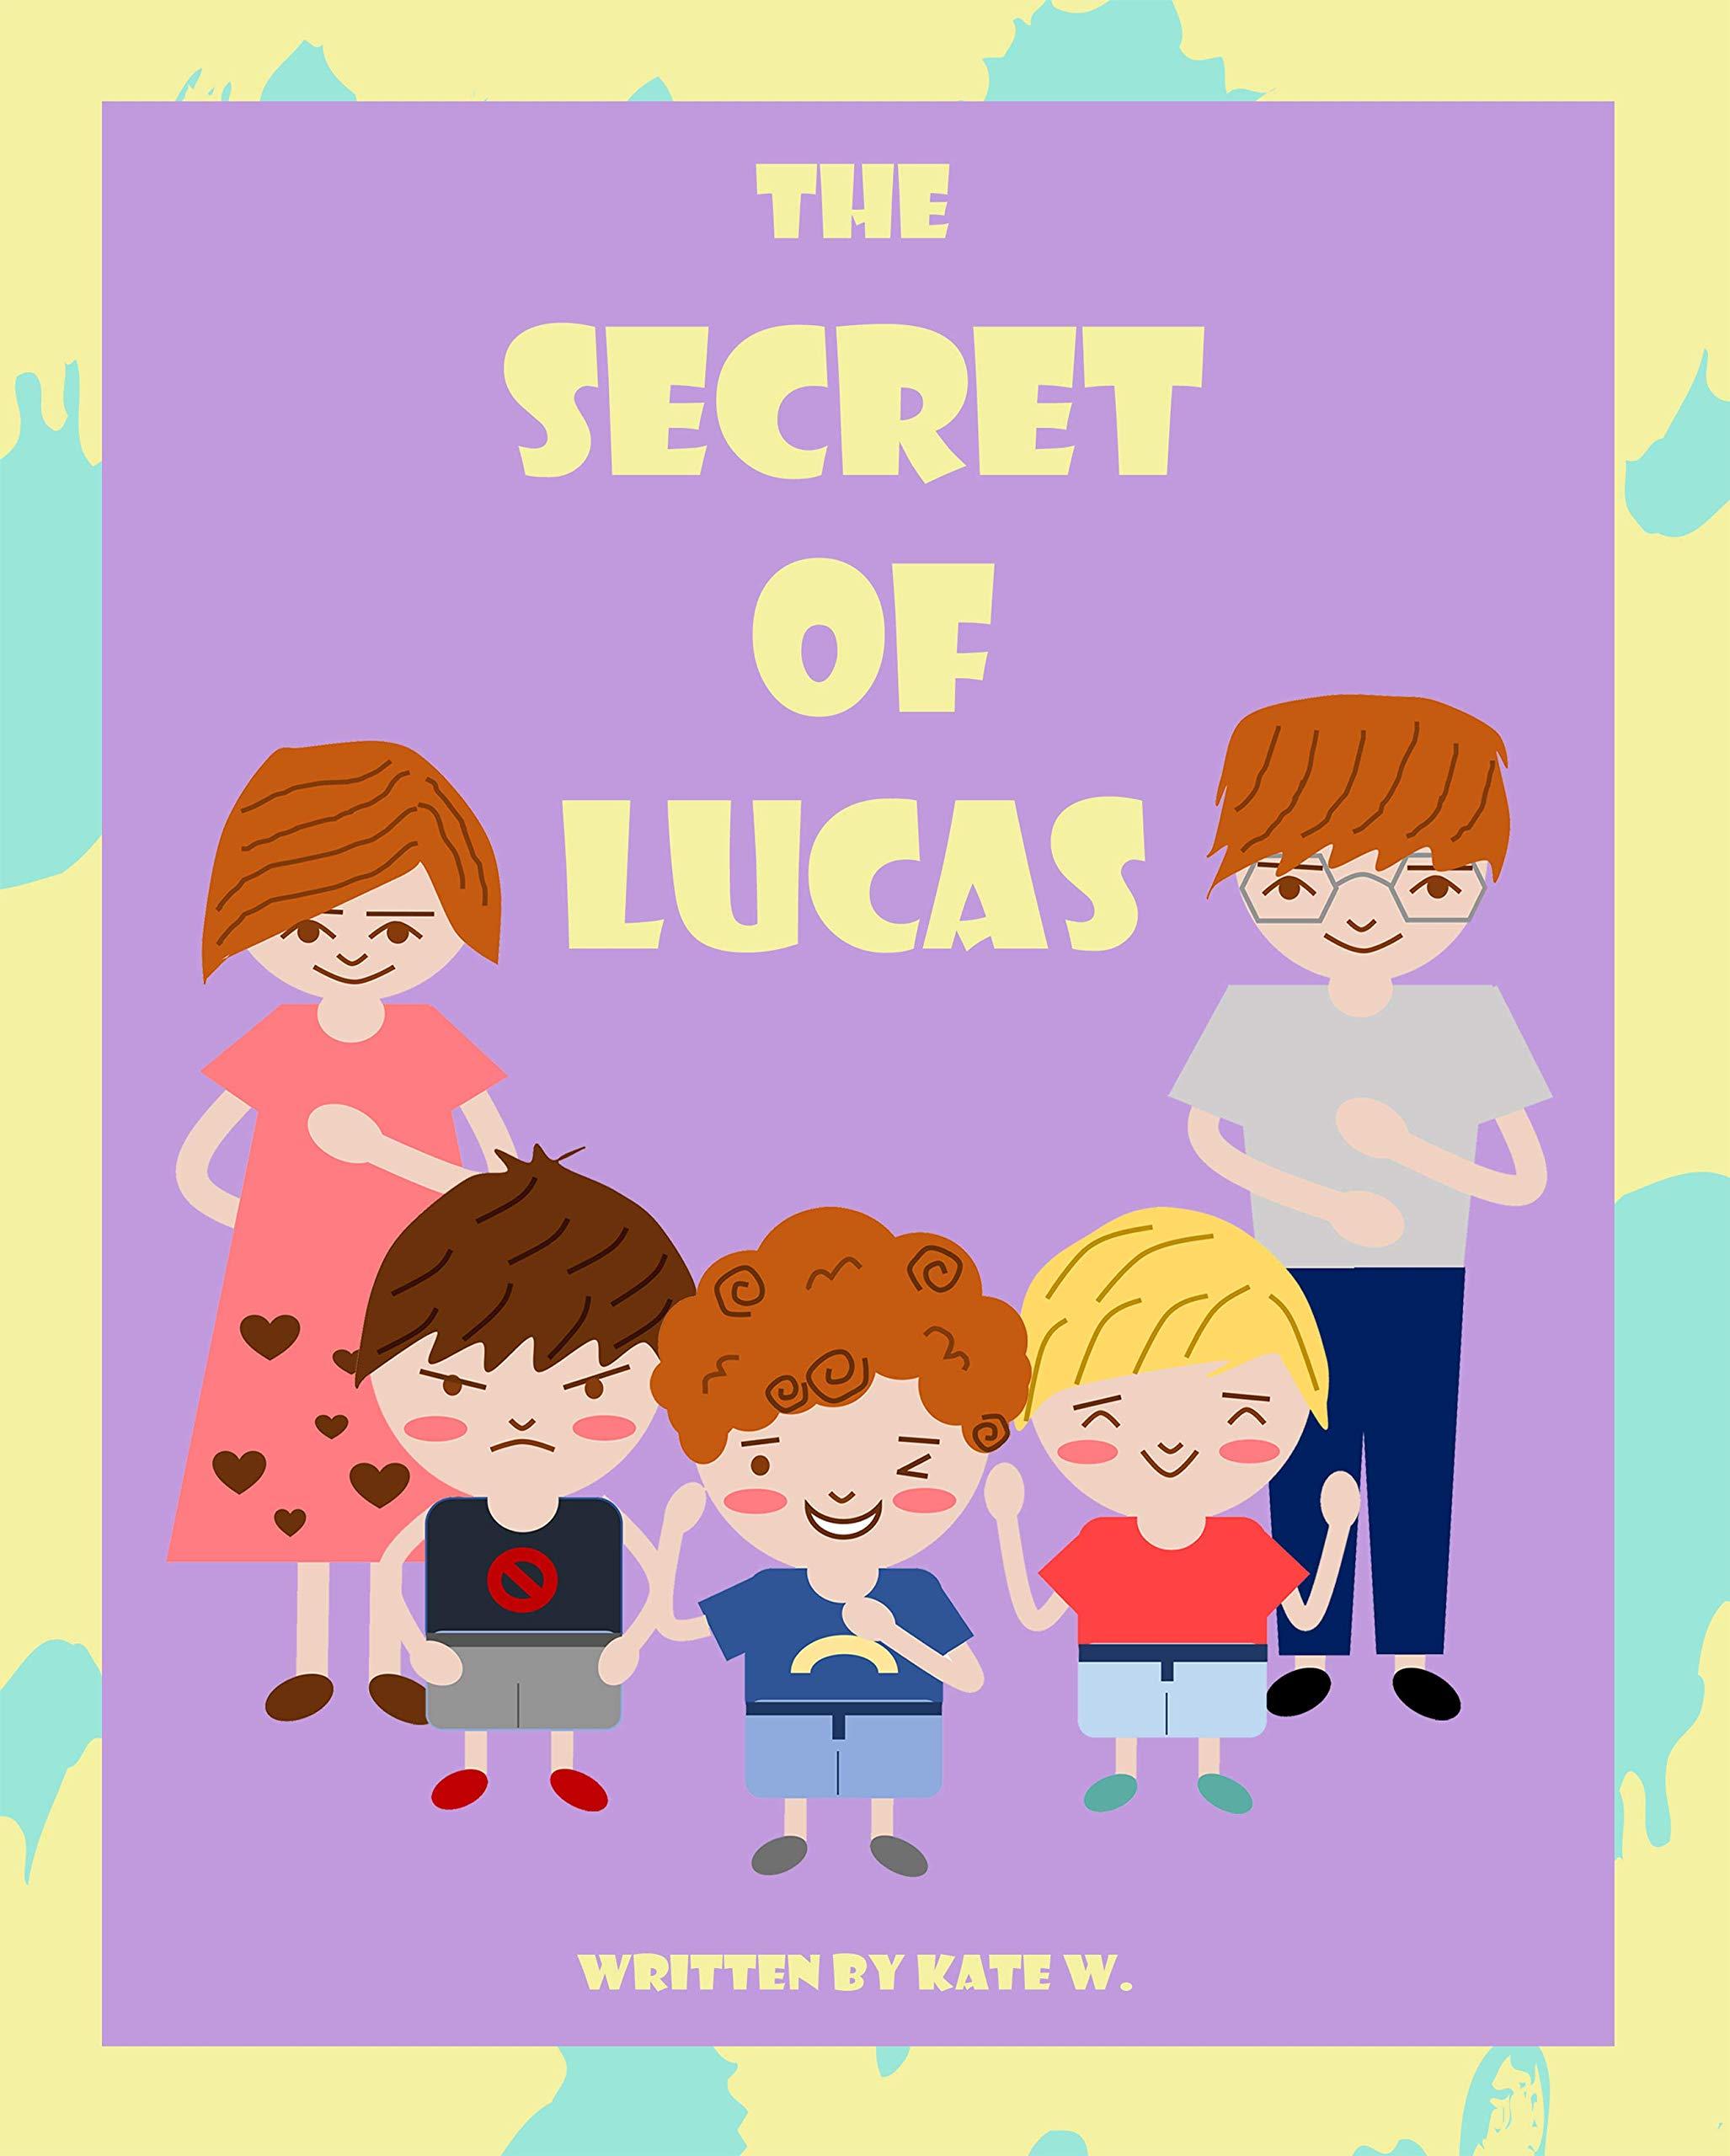 The secret of Lucas